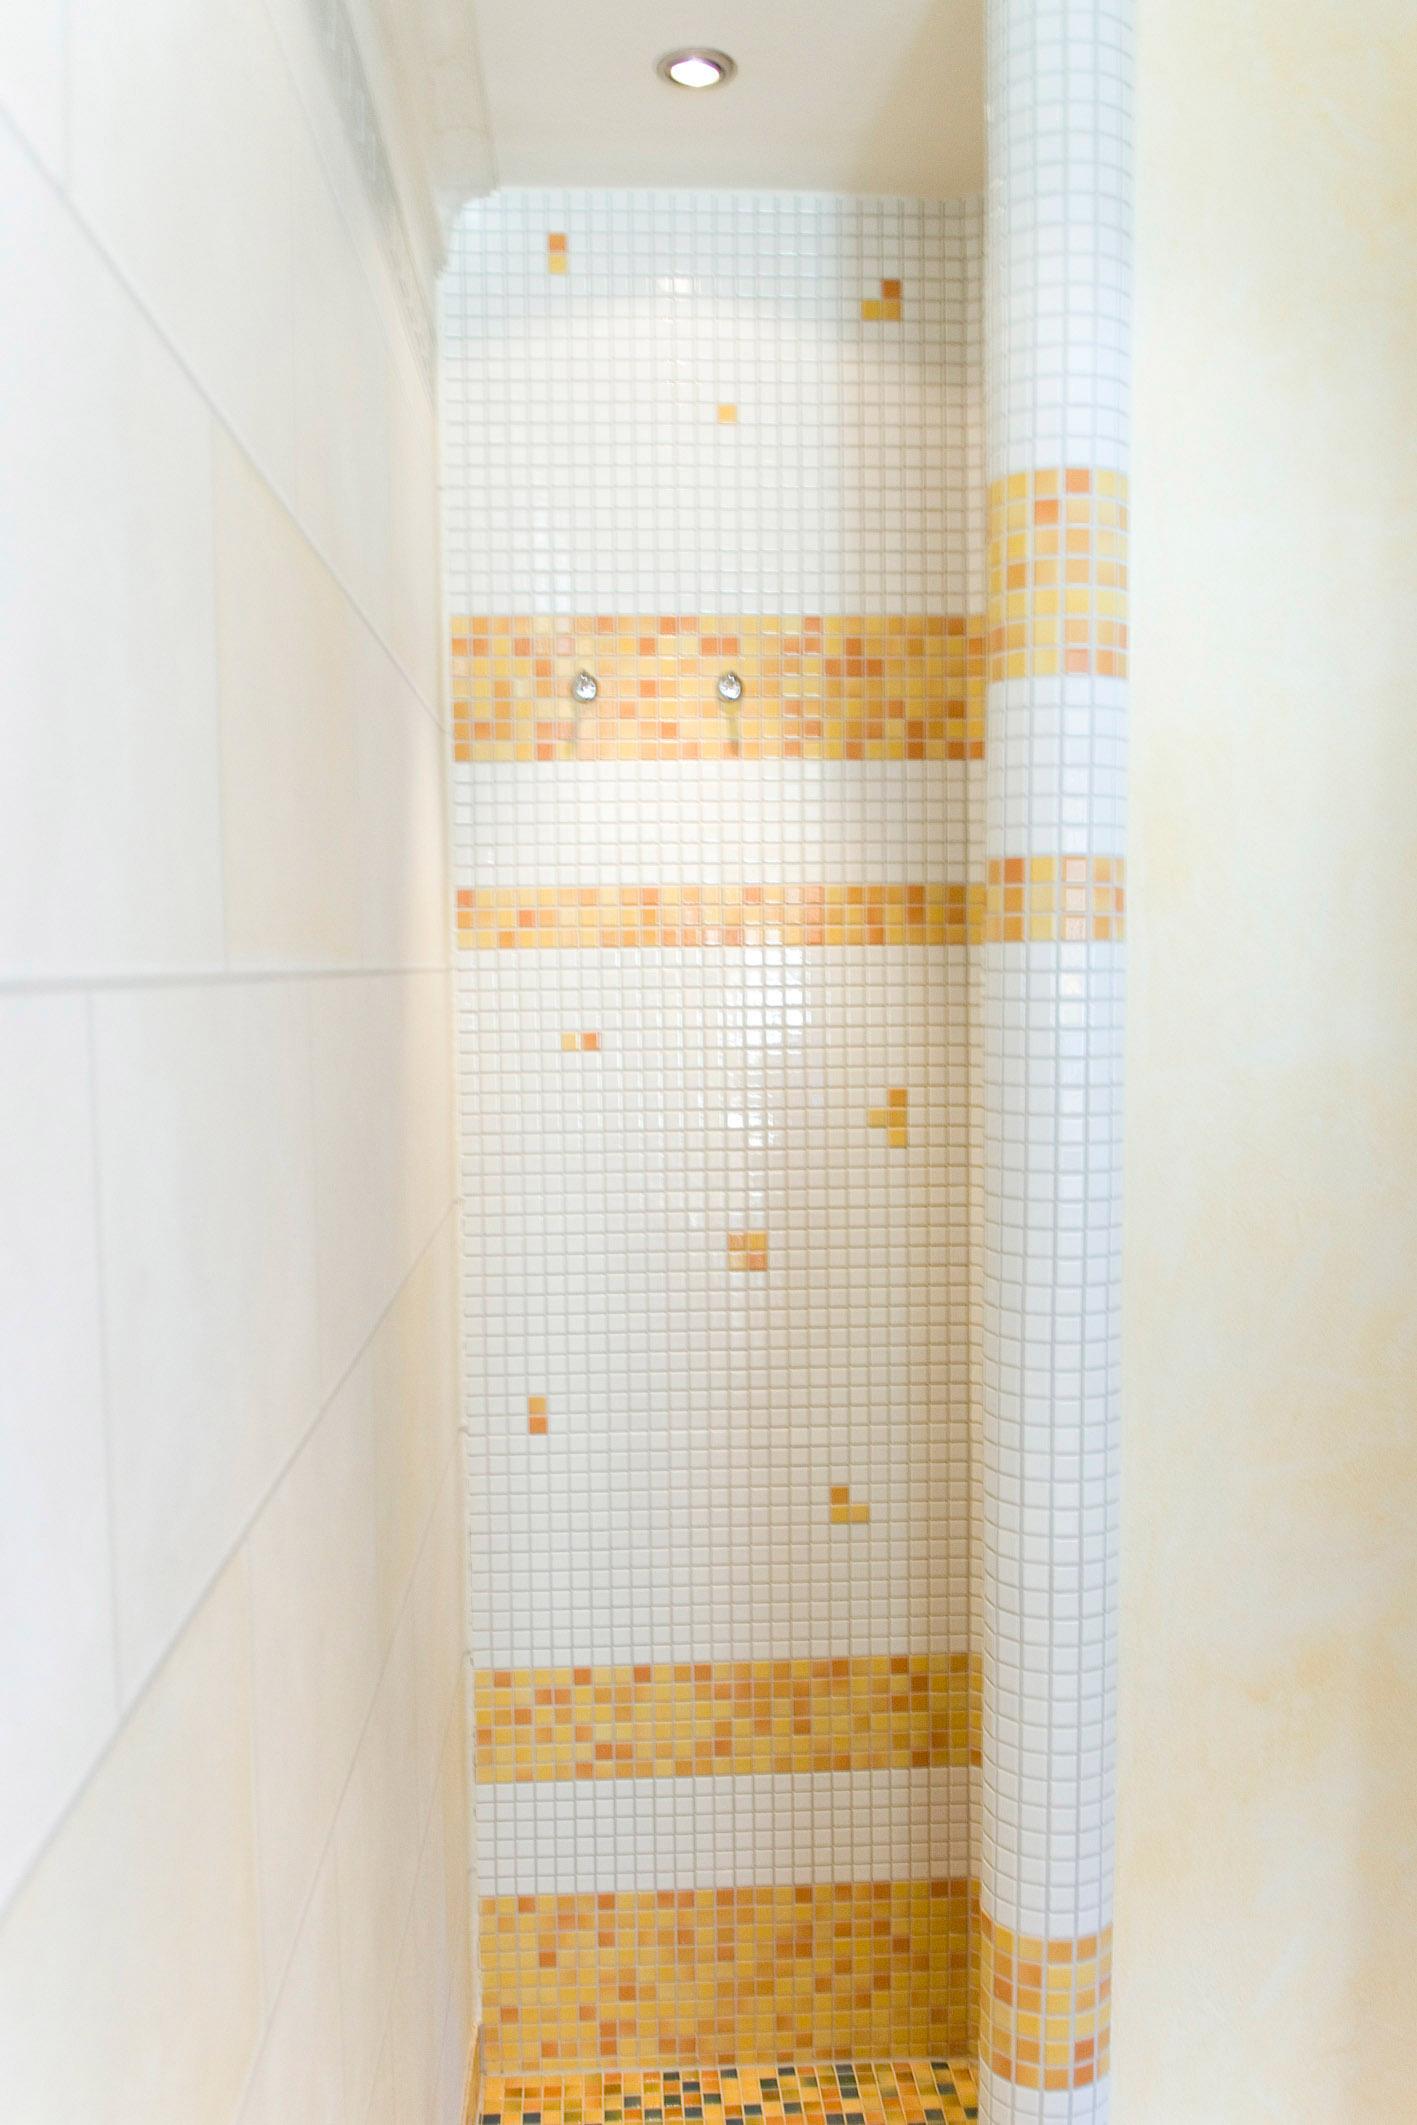 wilfer duschvergnuegen